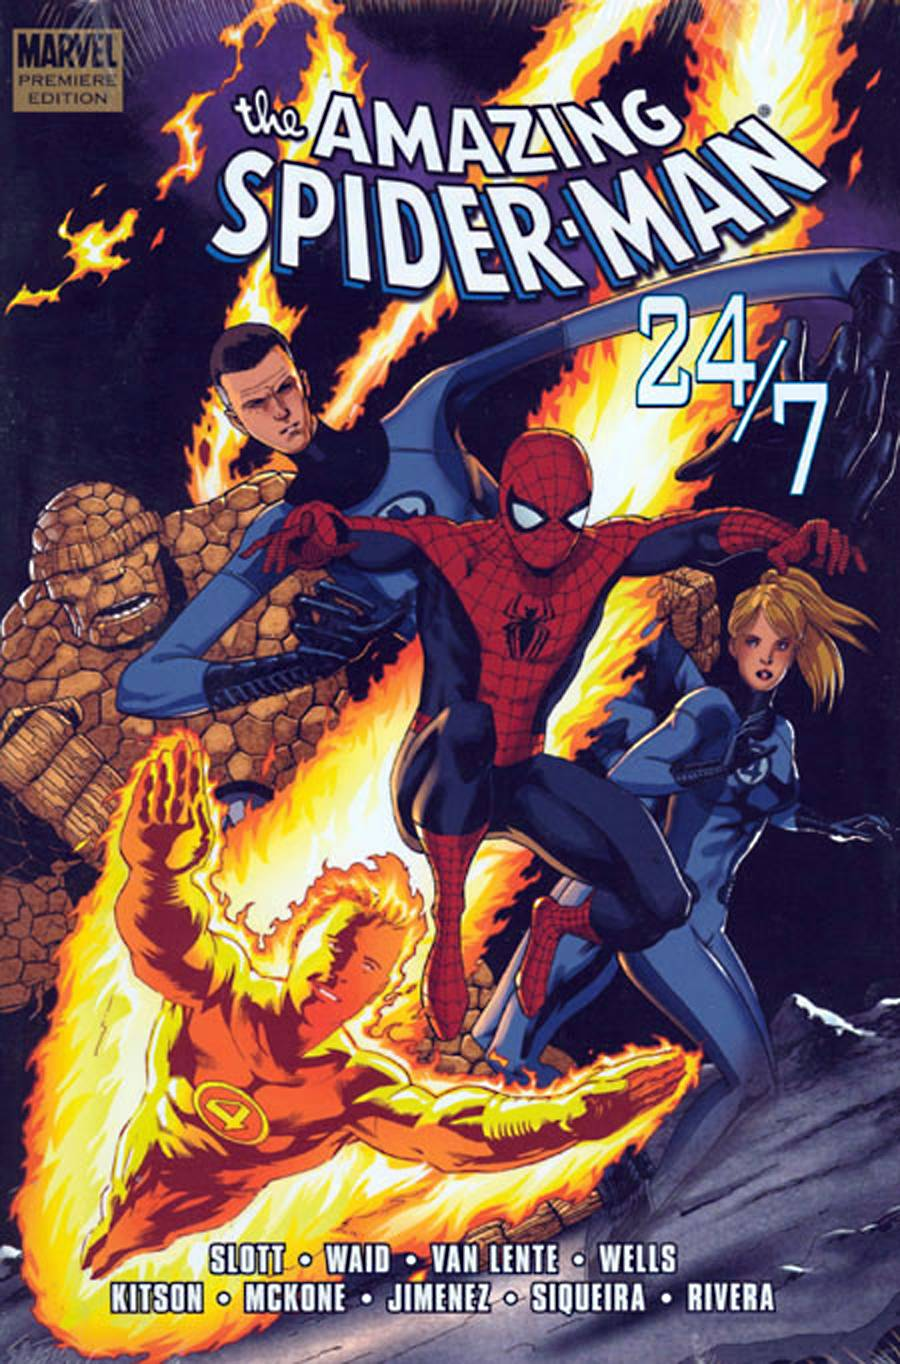 SPIDER-MAN 24-7 PREM HC